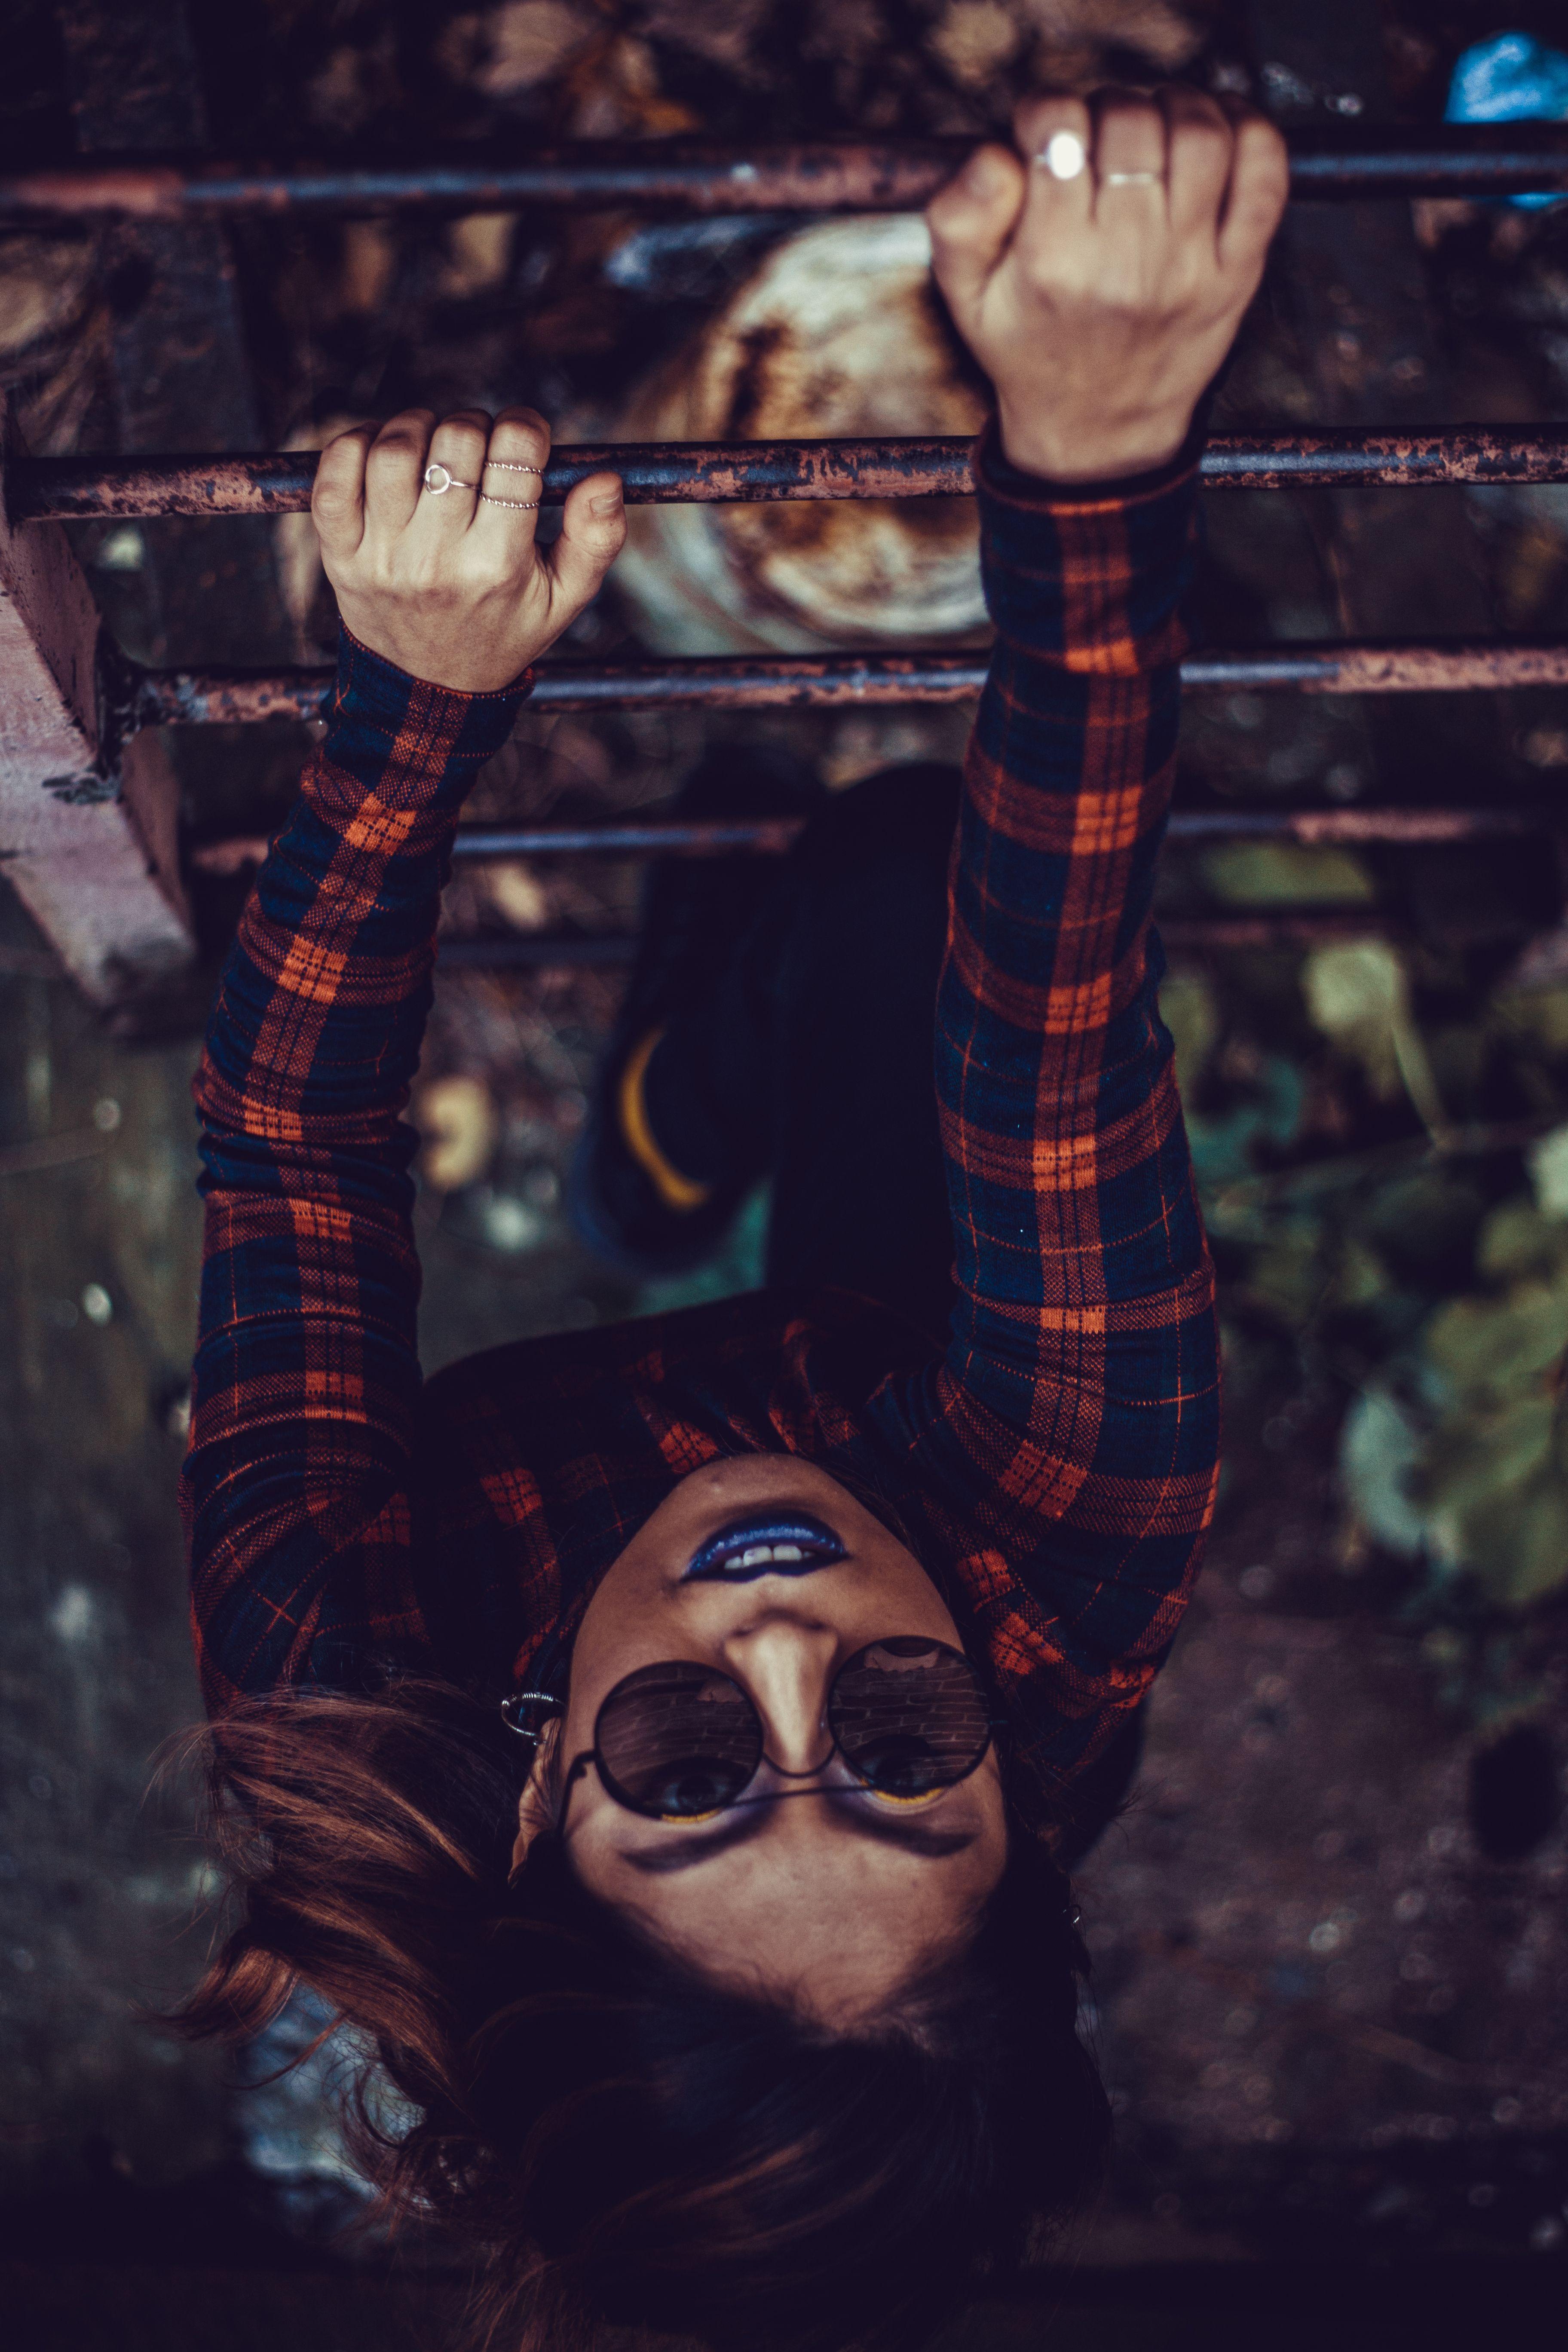 #amateurphotography #photography #amateurphoto #amateurphotos #beginnerphotography #amateurphotographer #canon #canonphotos #canonpolska #canonshot #canonshots #girl #gdanskiekadry #summer #portrait #portraitphotography #gdansk #cute #photomodel #photographer #photoshoot #gdansk #gorgeous #polishgirl #fit #stoczniacesarska #gdanskstocznia #fashion